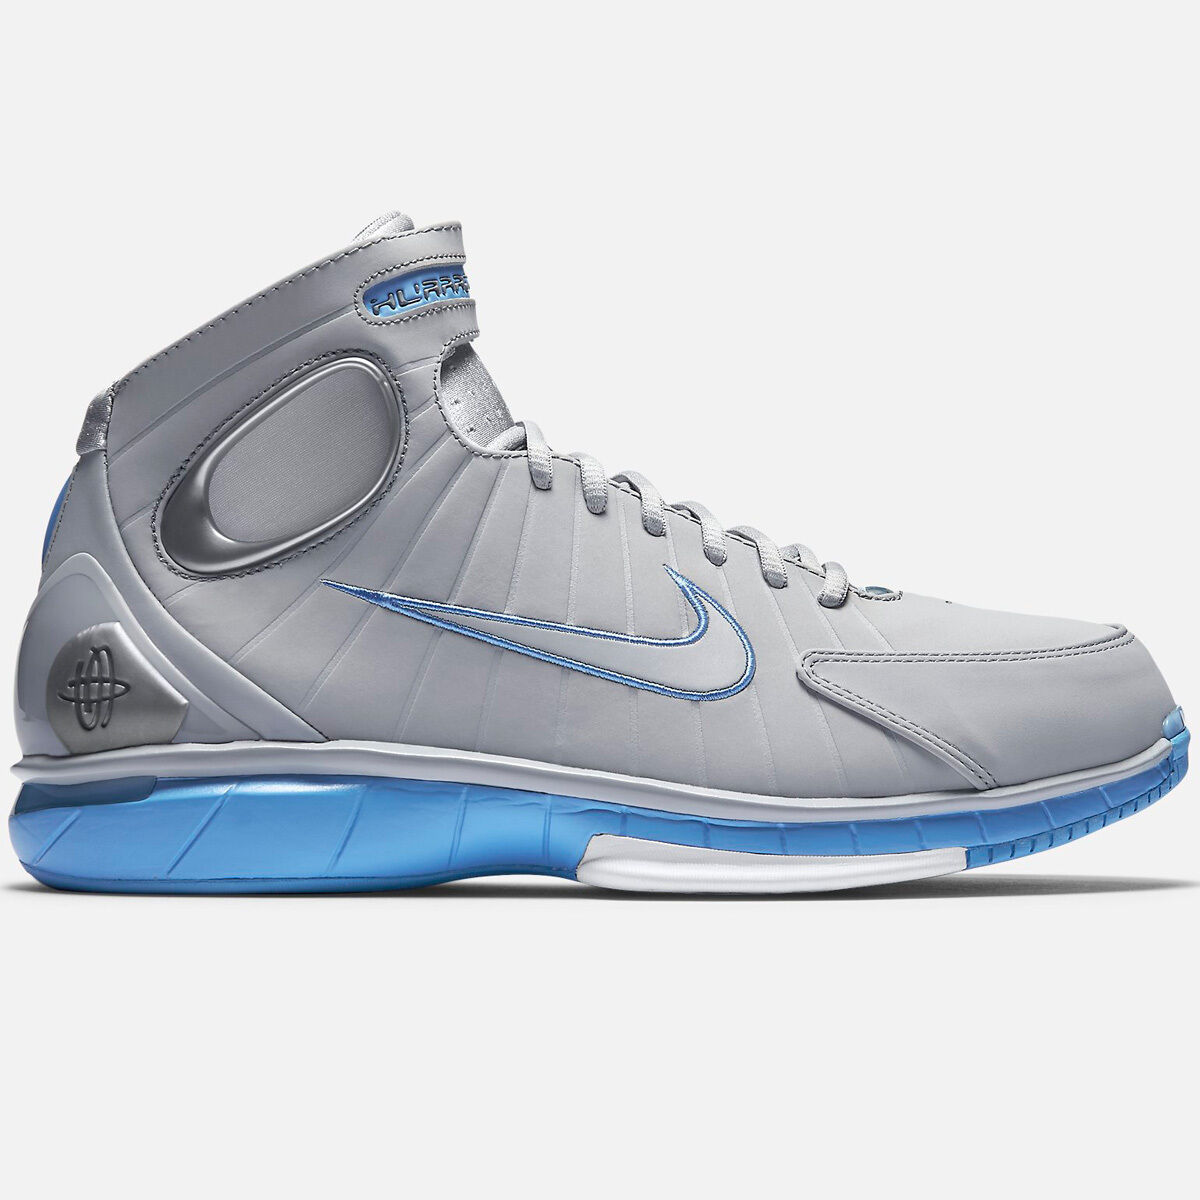 Nike Air Zoom Huarache 2K4 Sz 10.5 12 Wolf Grigio Carolina Blue 2004 704830-400